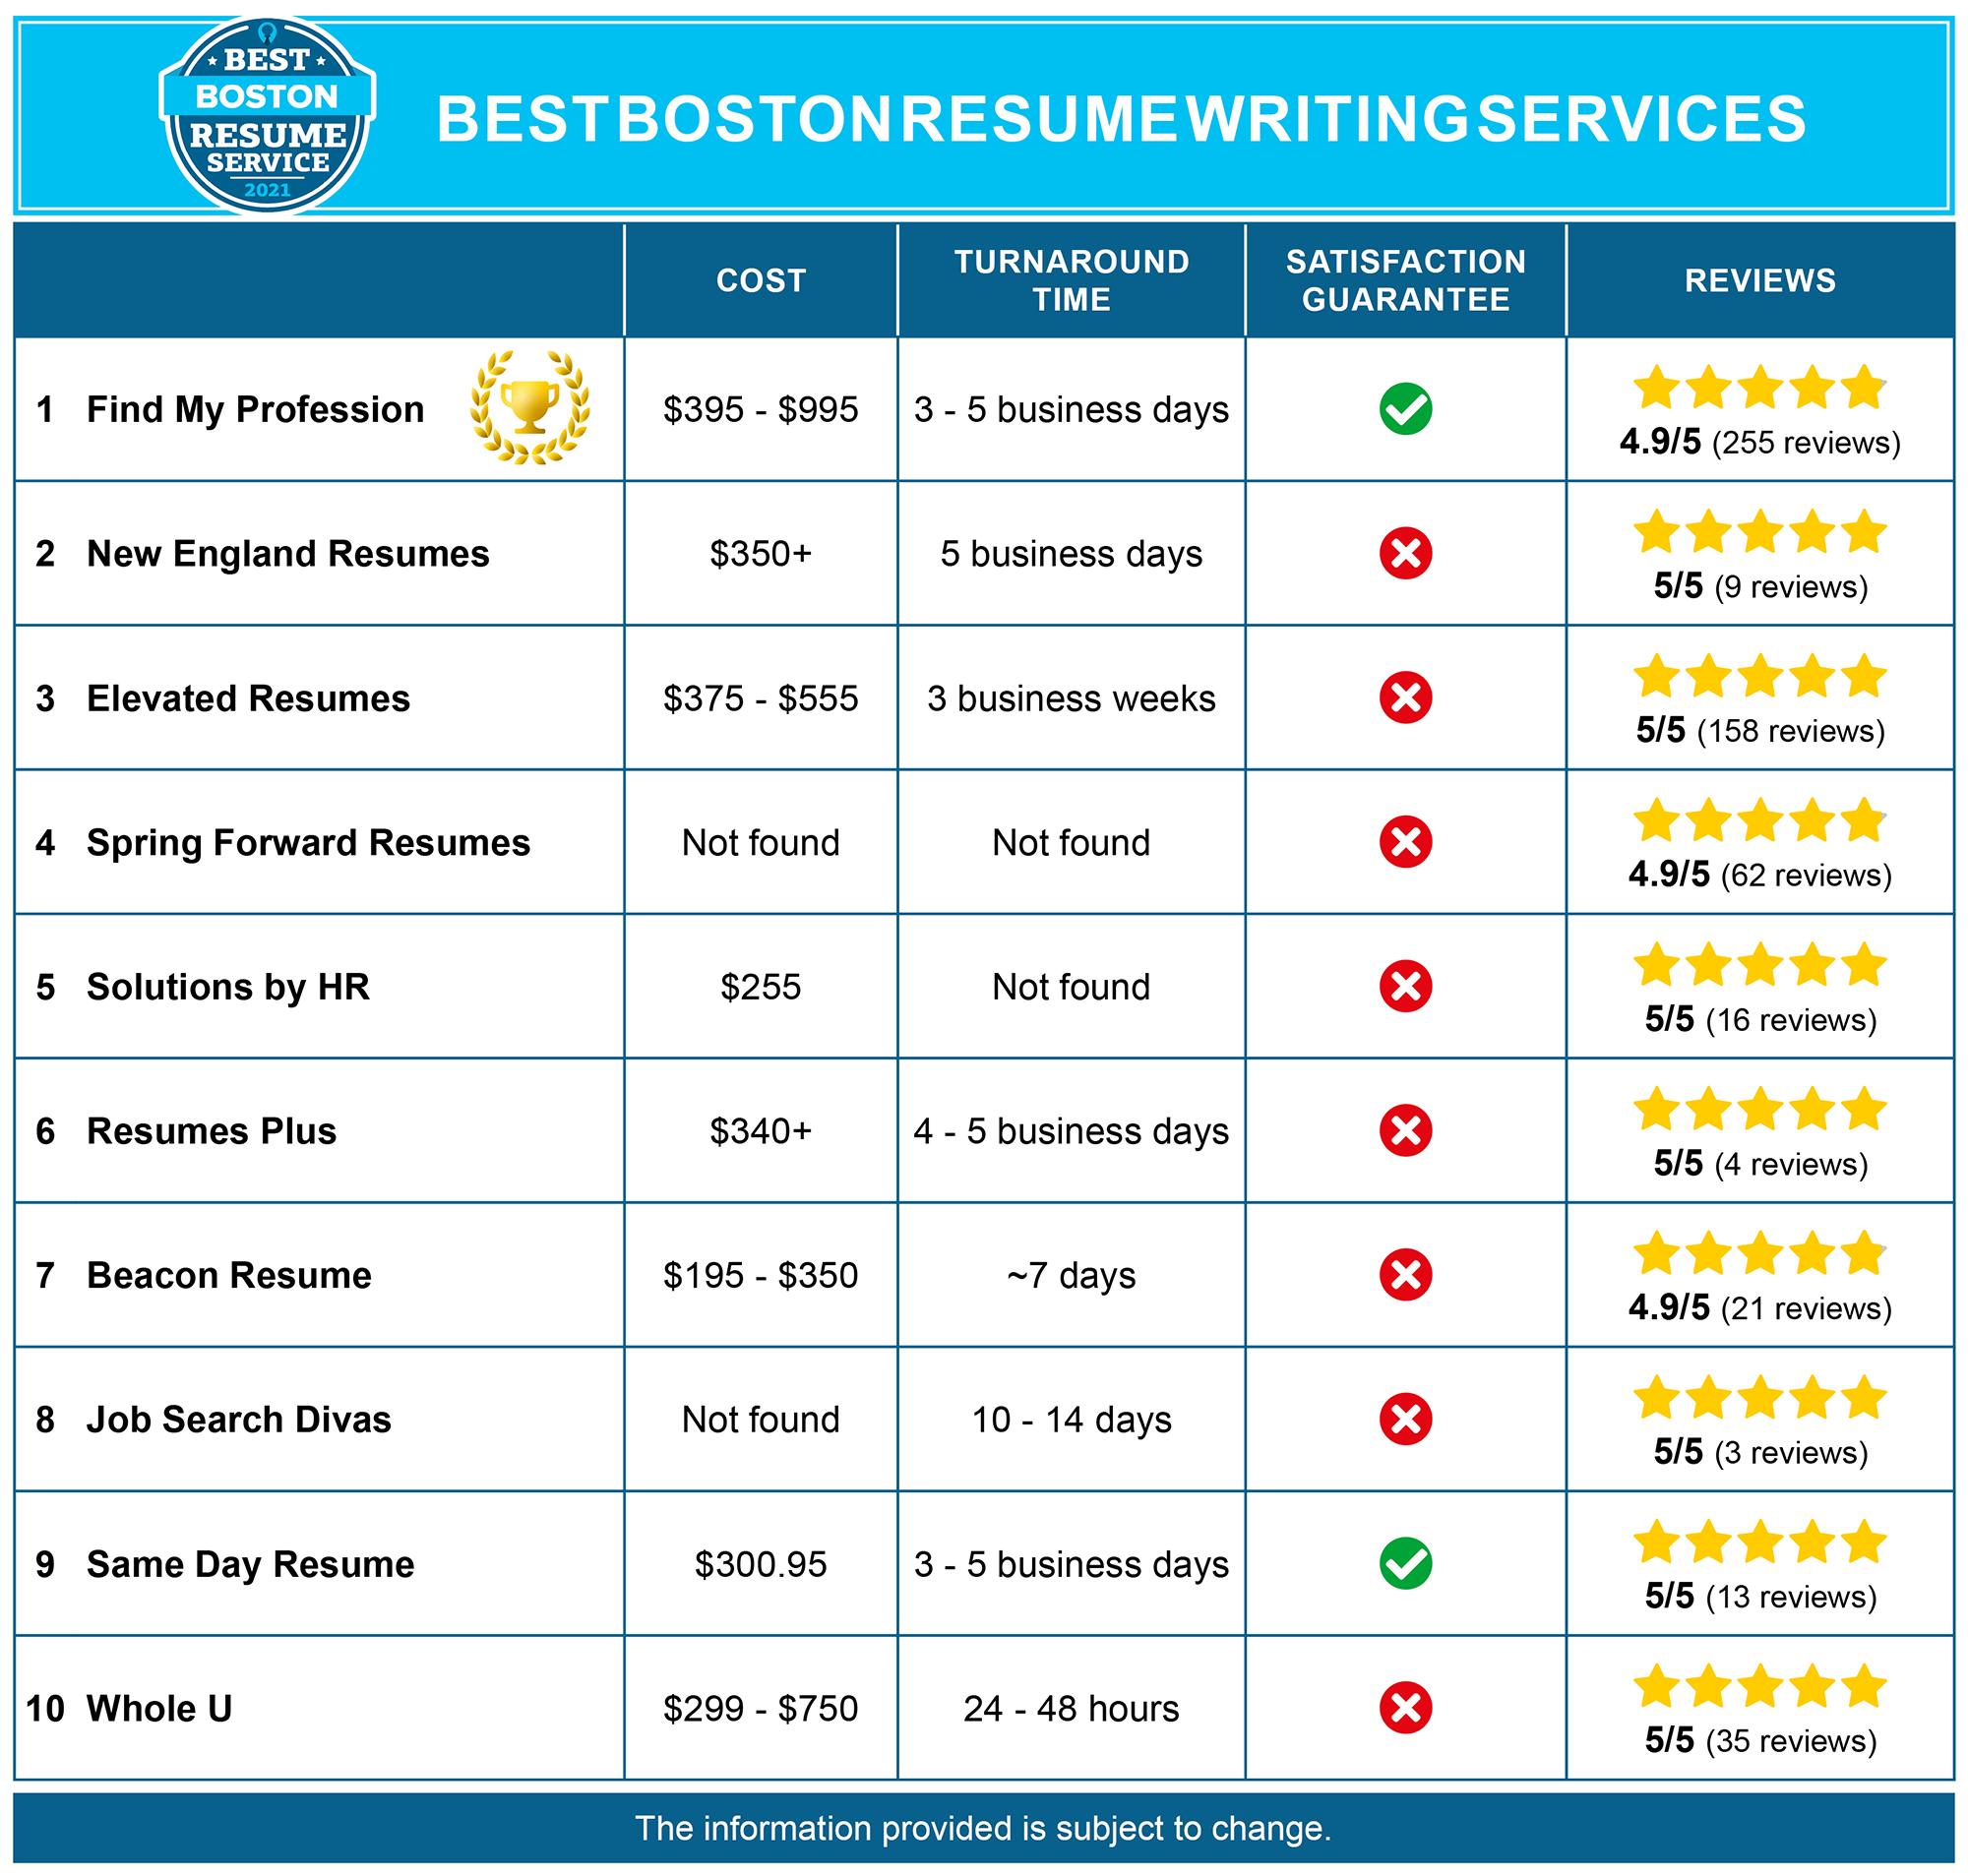 Best Boston Resume Services